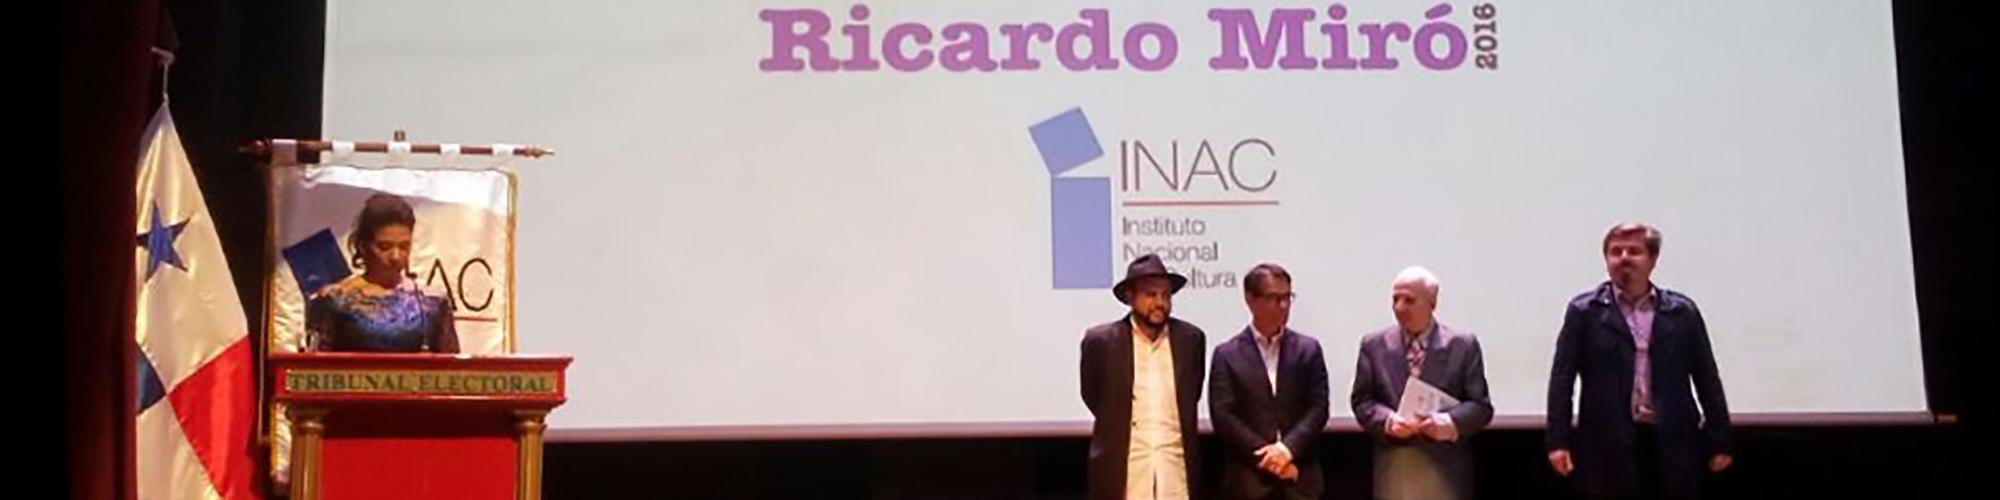 Ricardo Miro Presentation